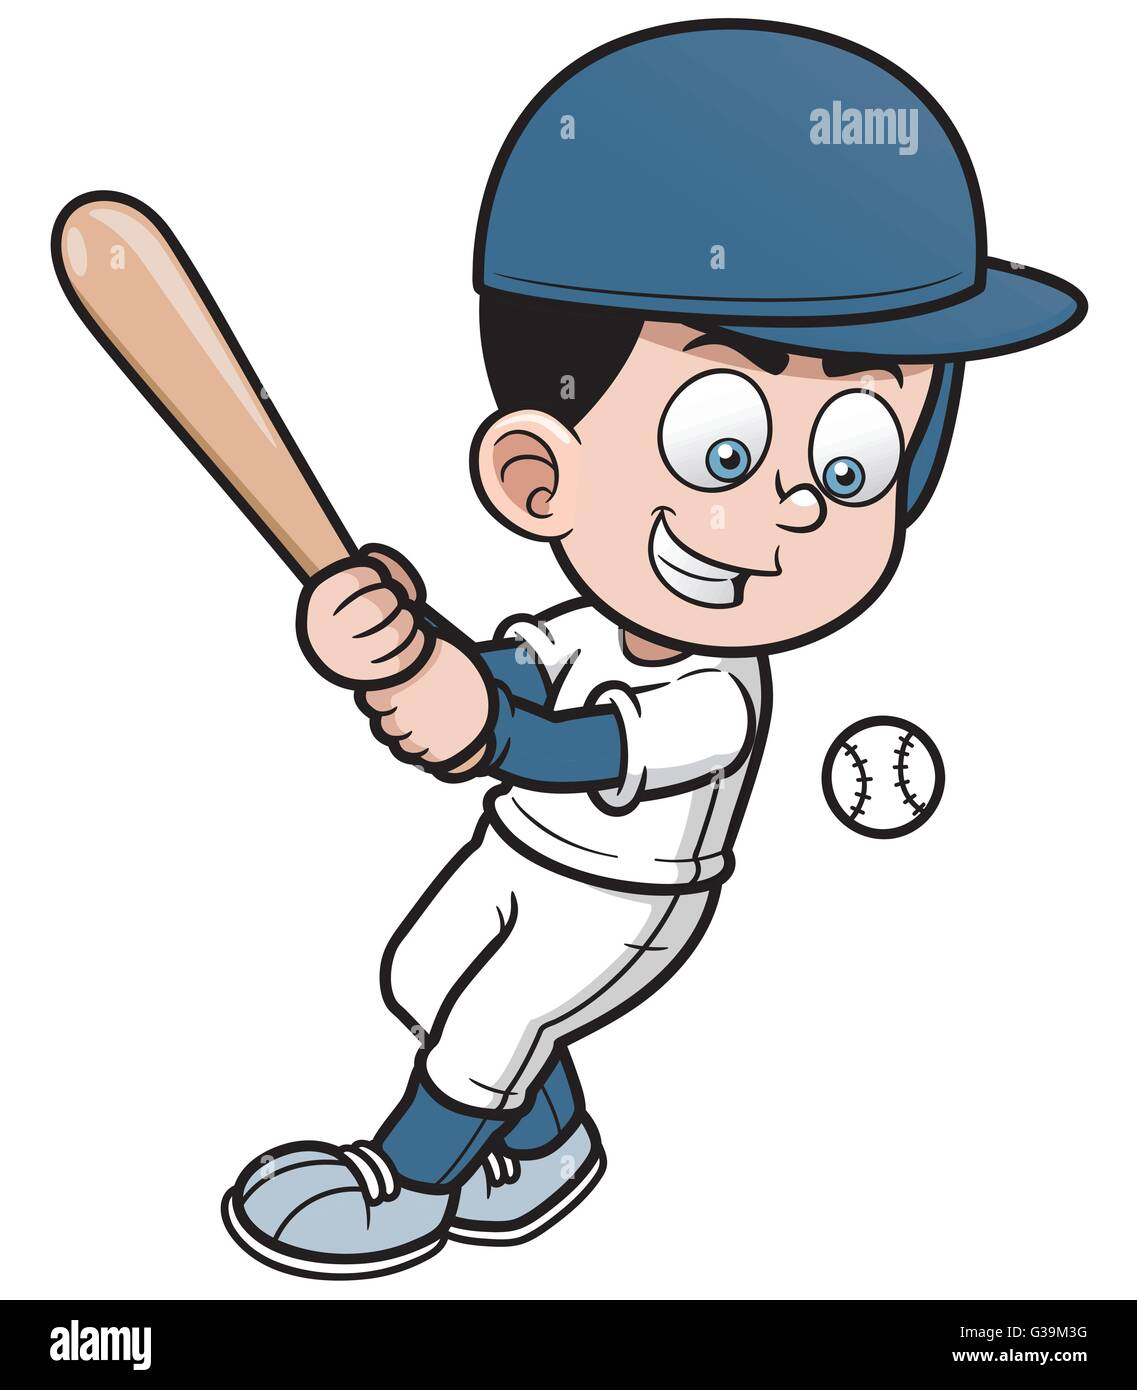 vector illustration of cartoon baseball player stock baseball player clip art free printable baseball player clip art free printable